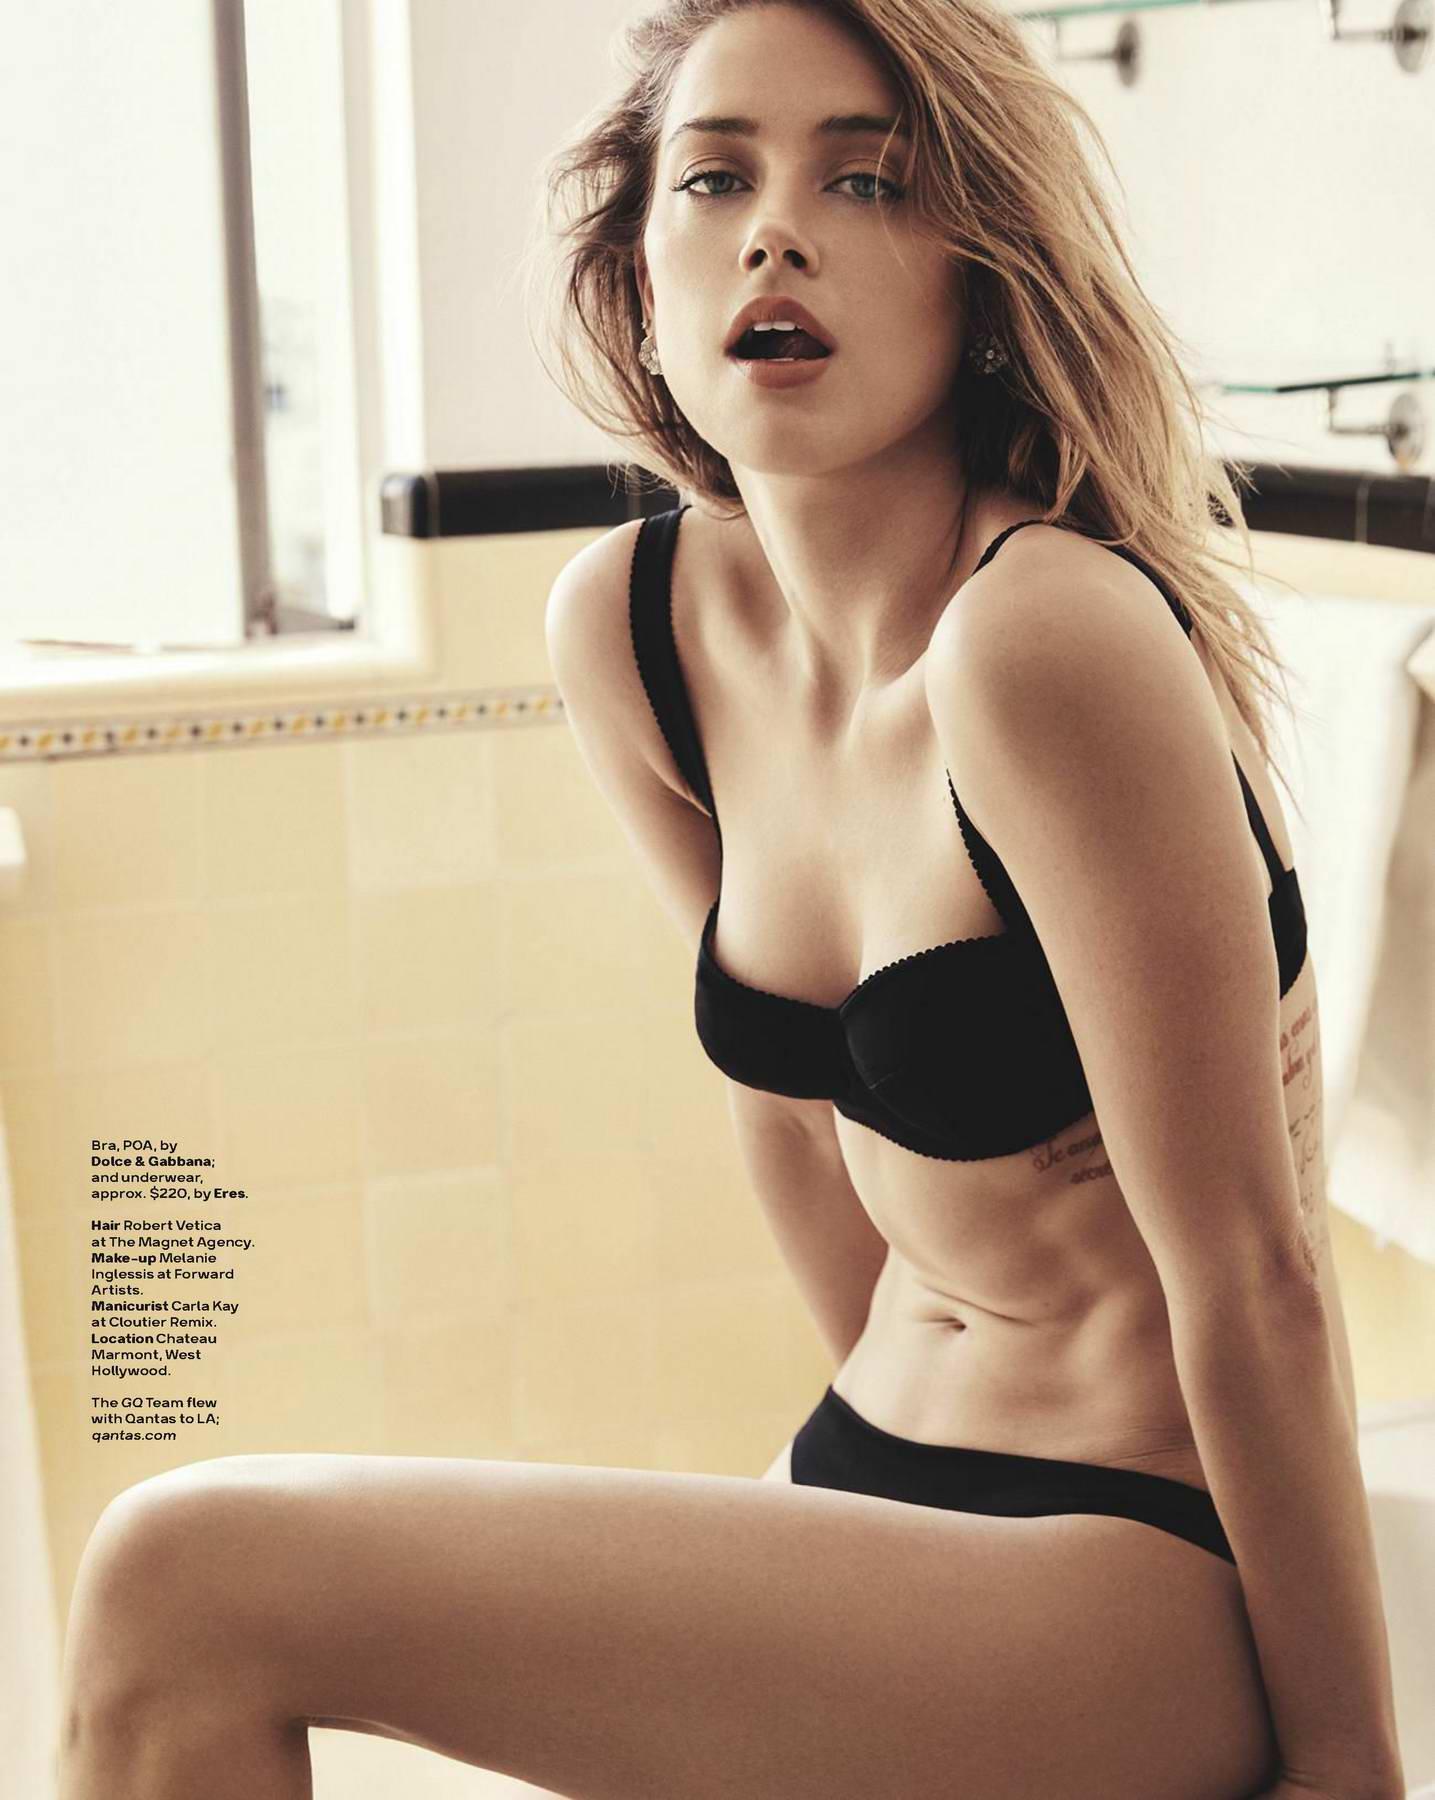 Bikini Amber Heard nude (89 photos), Ass, Leaked, Selfie, braless 2020